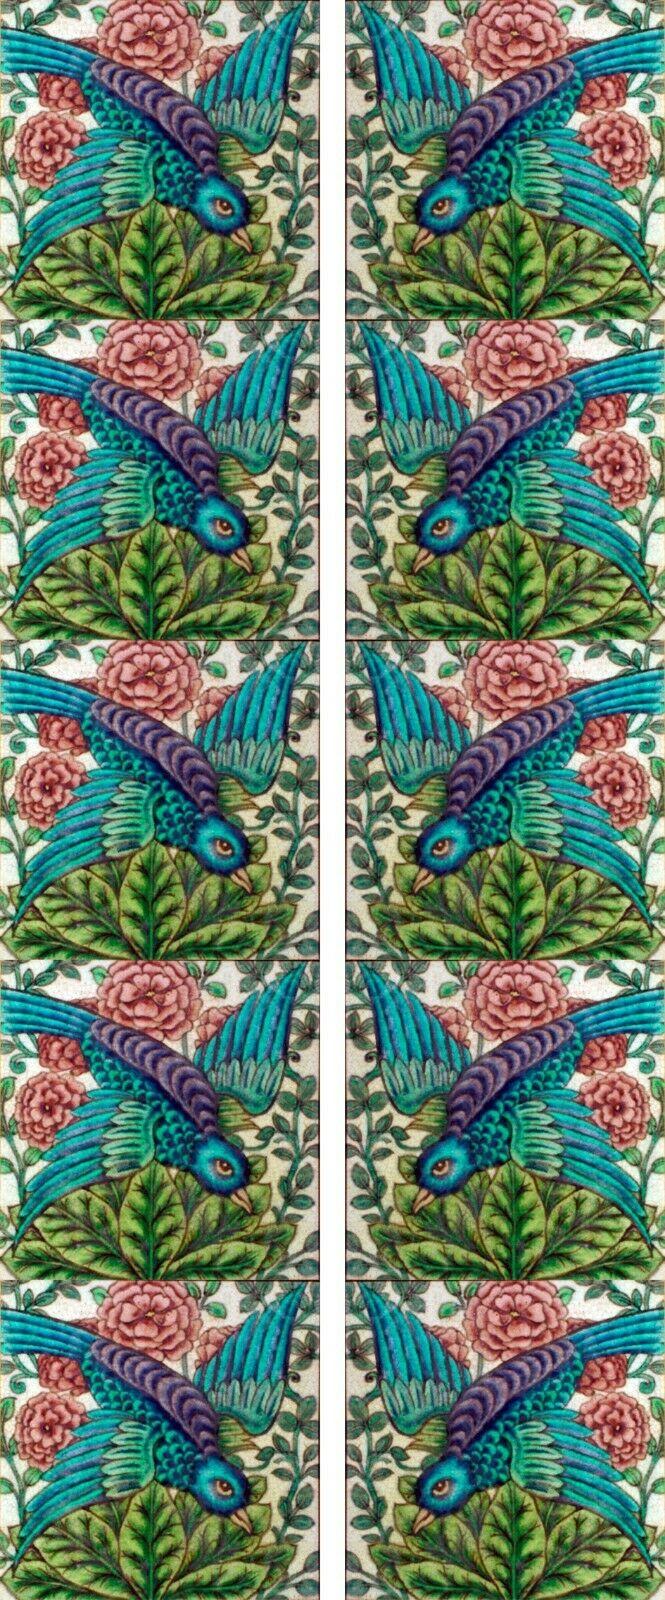 William de Morgan Diving Bird Fireplace Tile Set